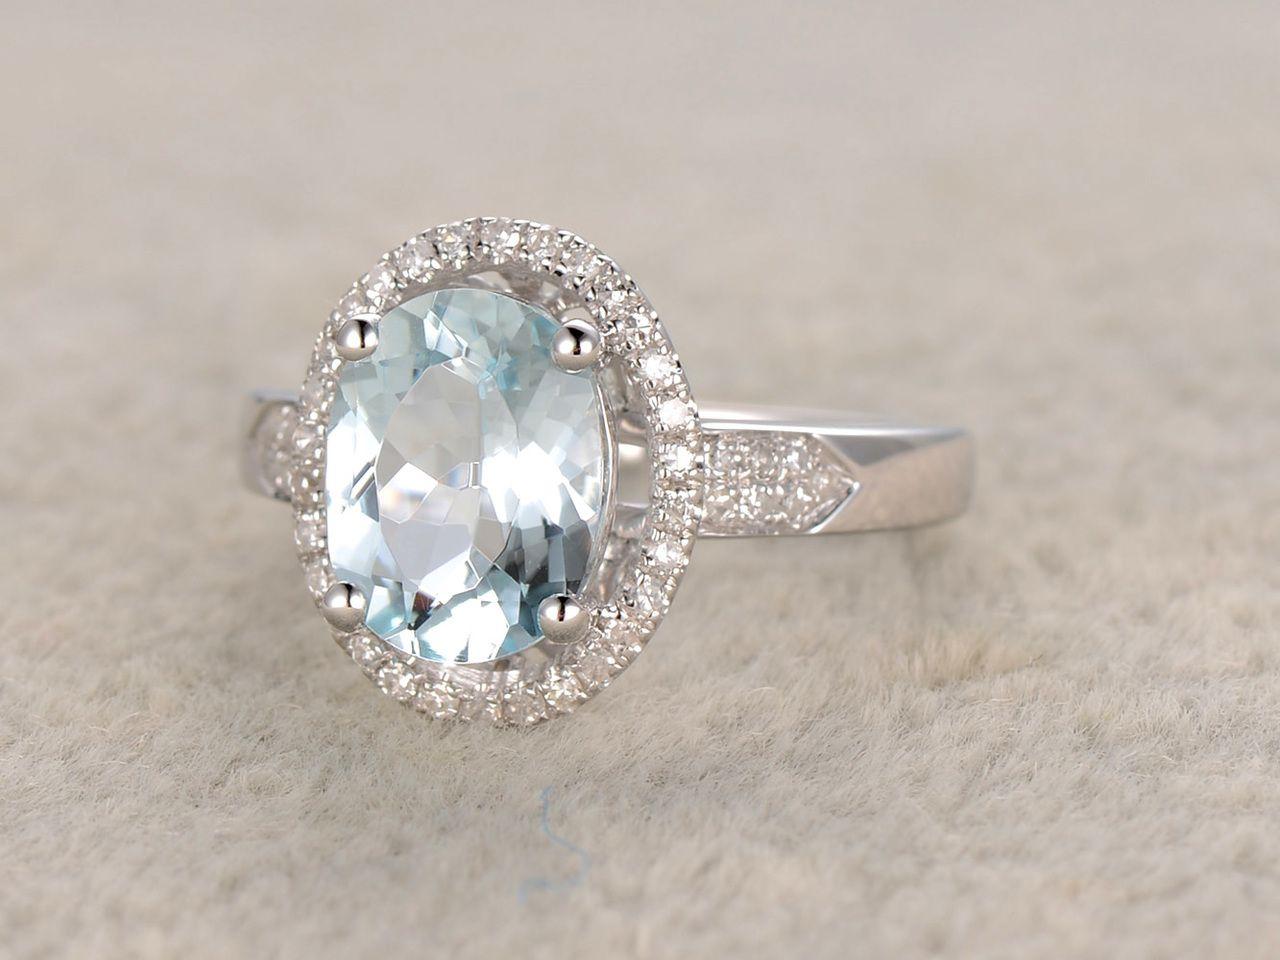 6x8mm oval aquamarine engagement ring diamond wedding ring